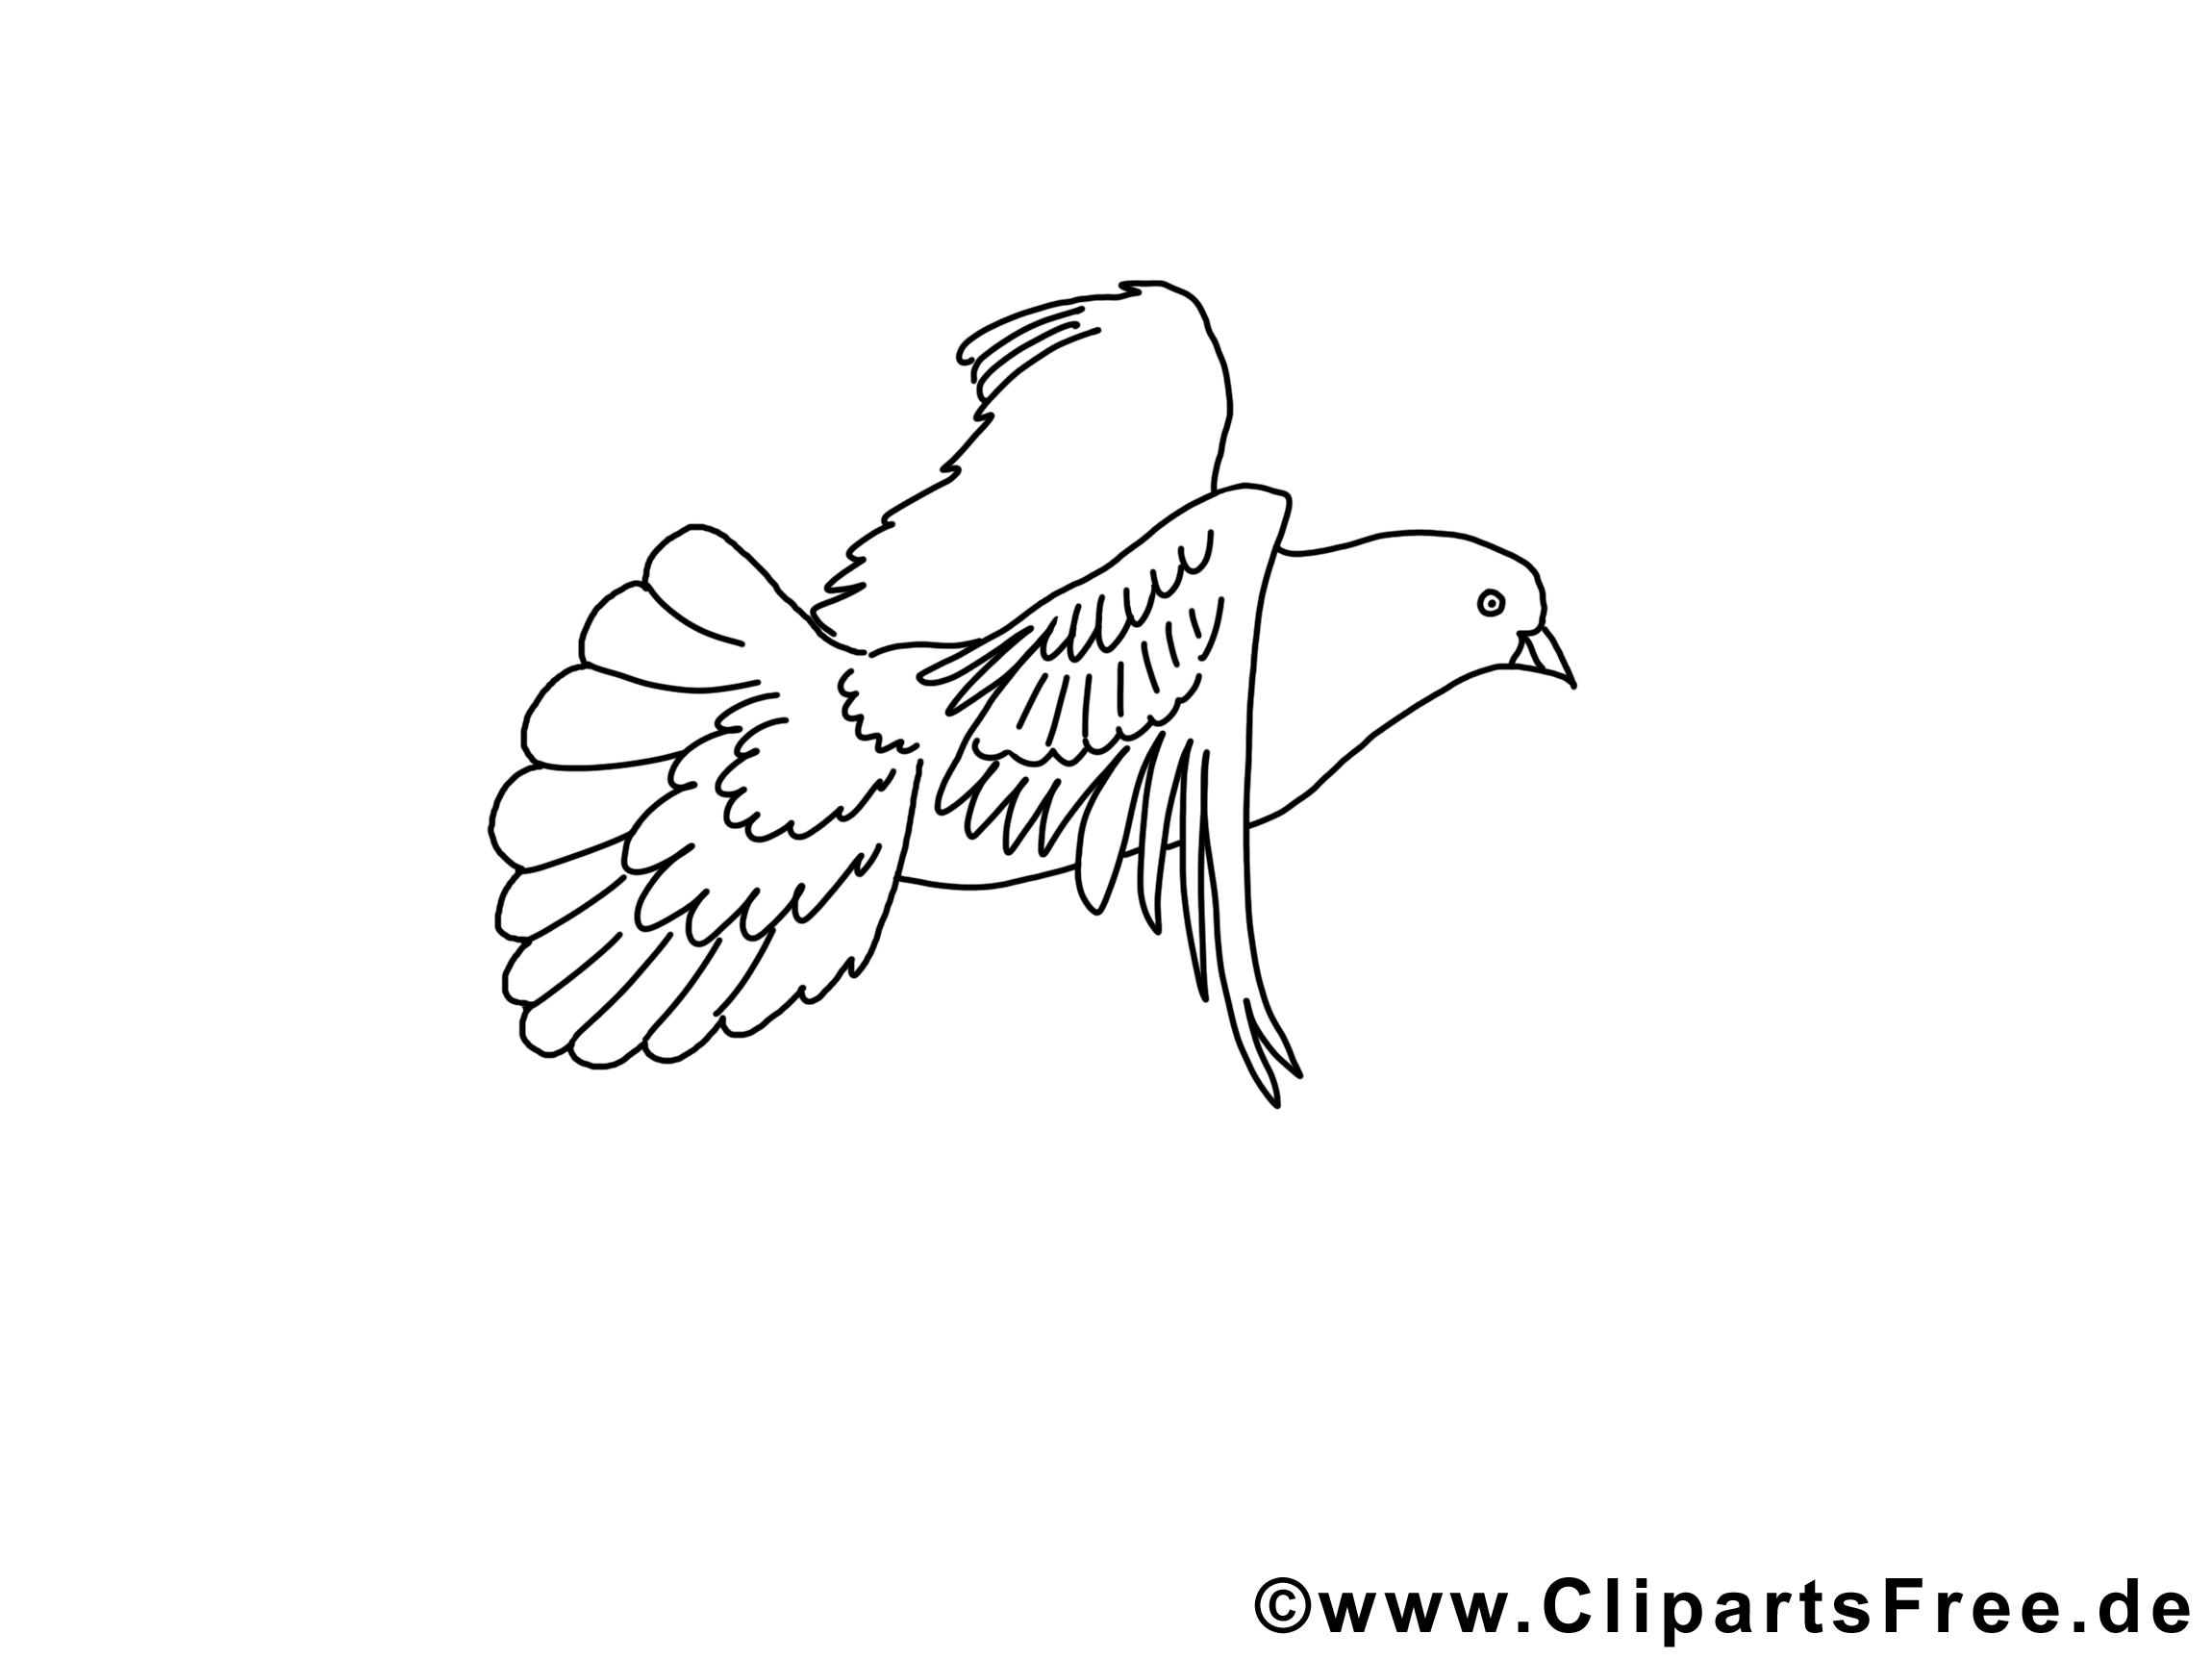 Dessin colombe pentec te gratuits imprimer pentec te coloriages dessin picture image - Dessin colombe gratuit ...